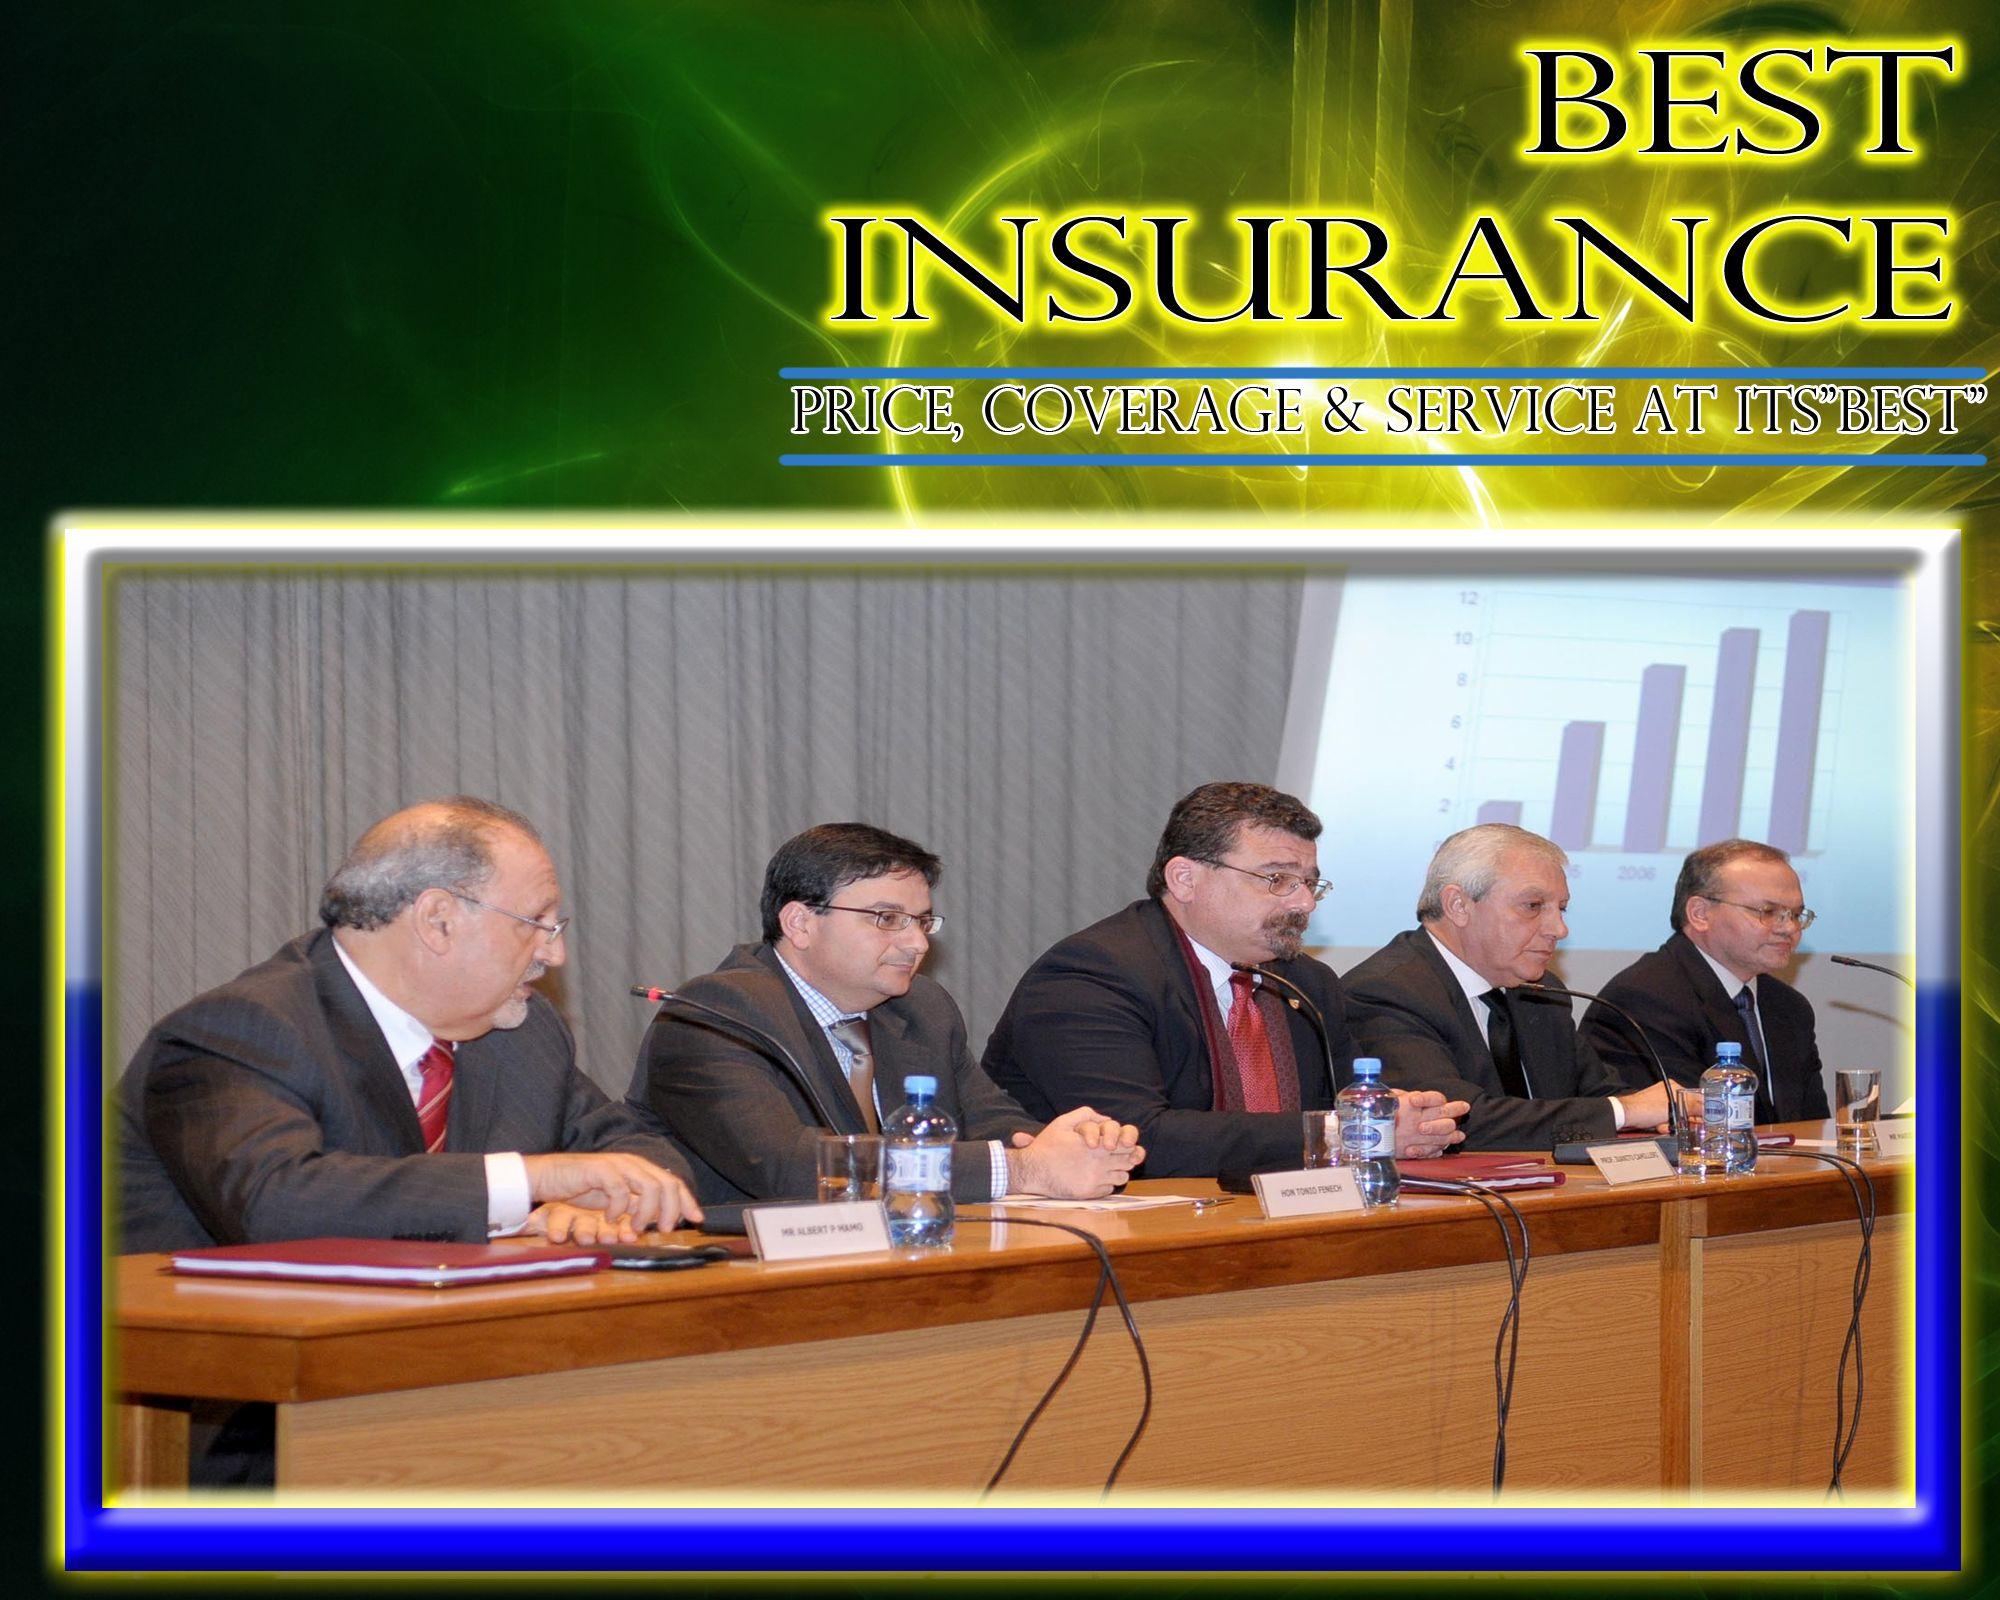 HomeOwnersInsuranceFt.Lauderdale Insurance Degree Best